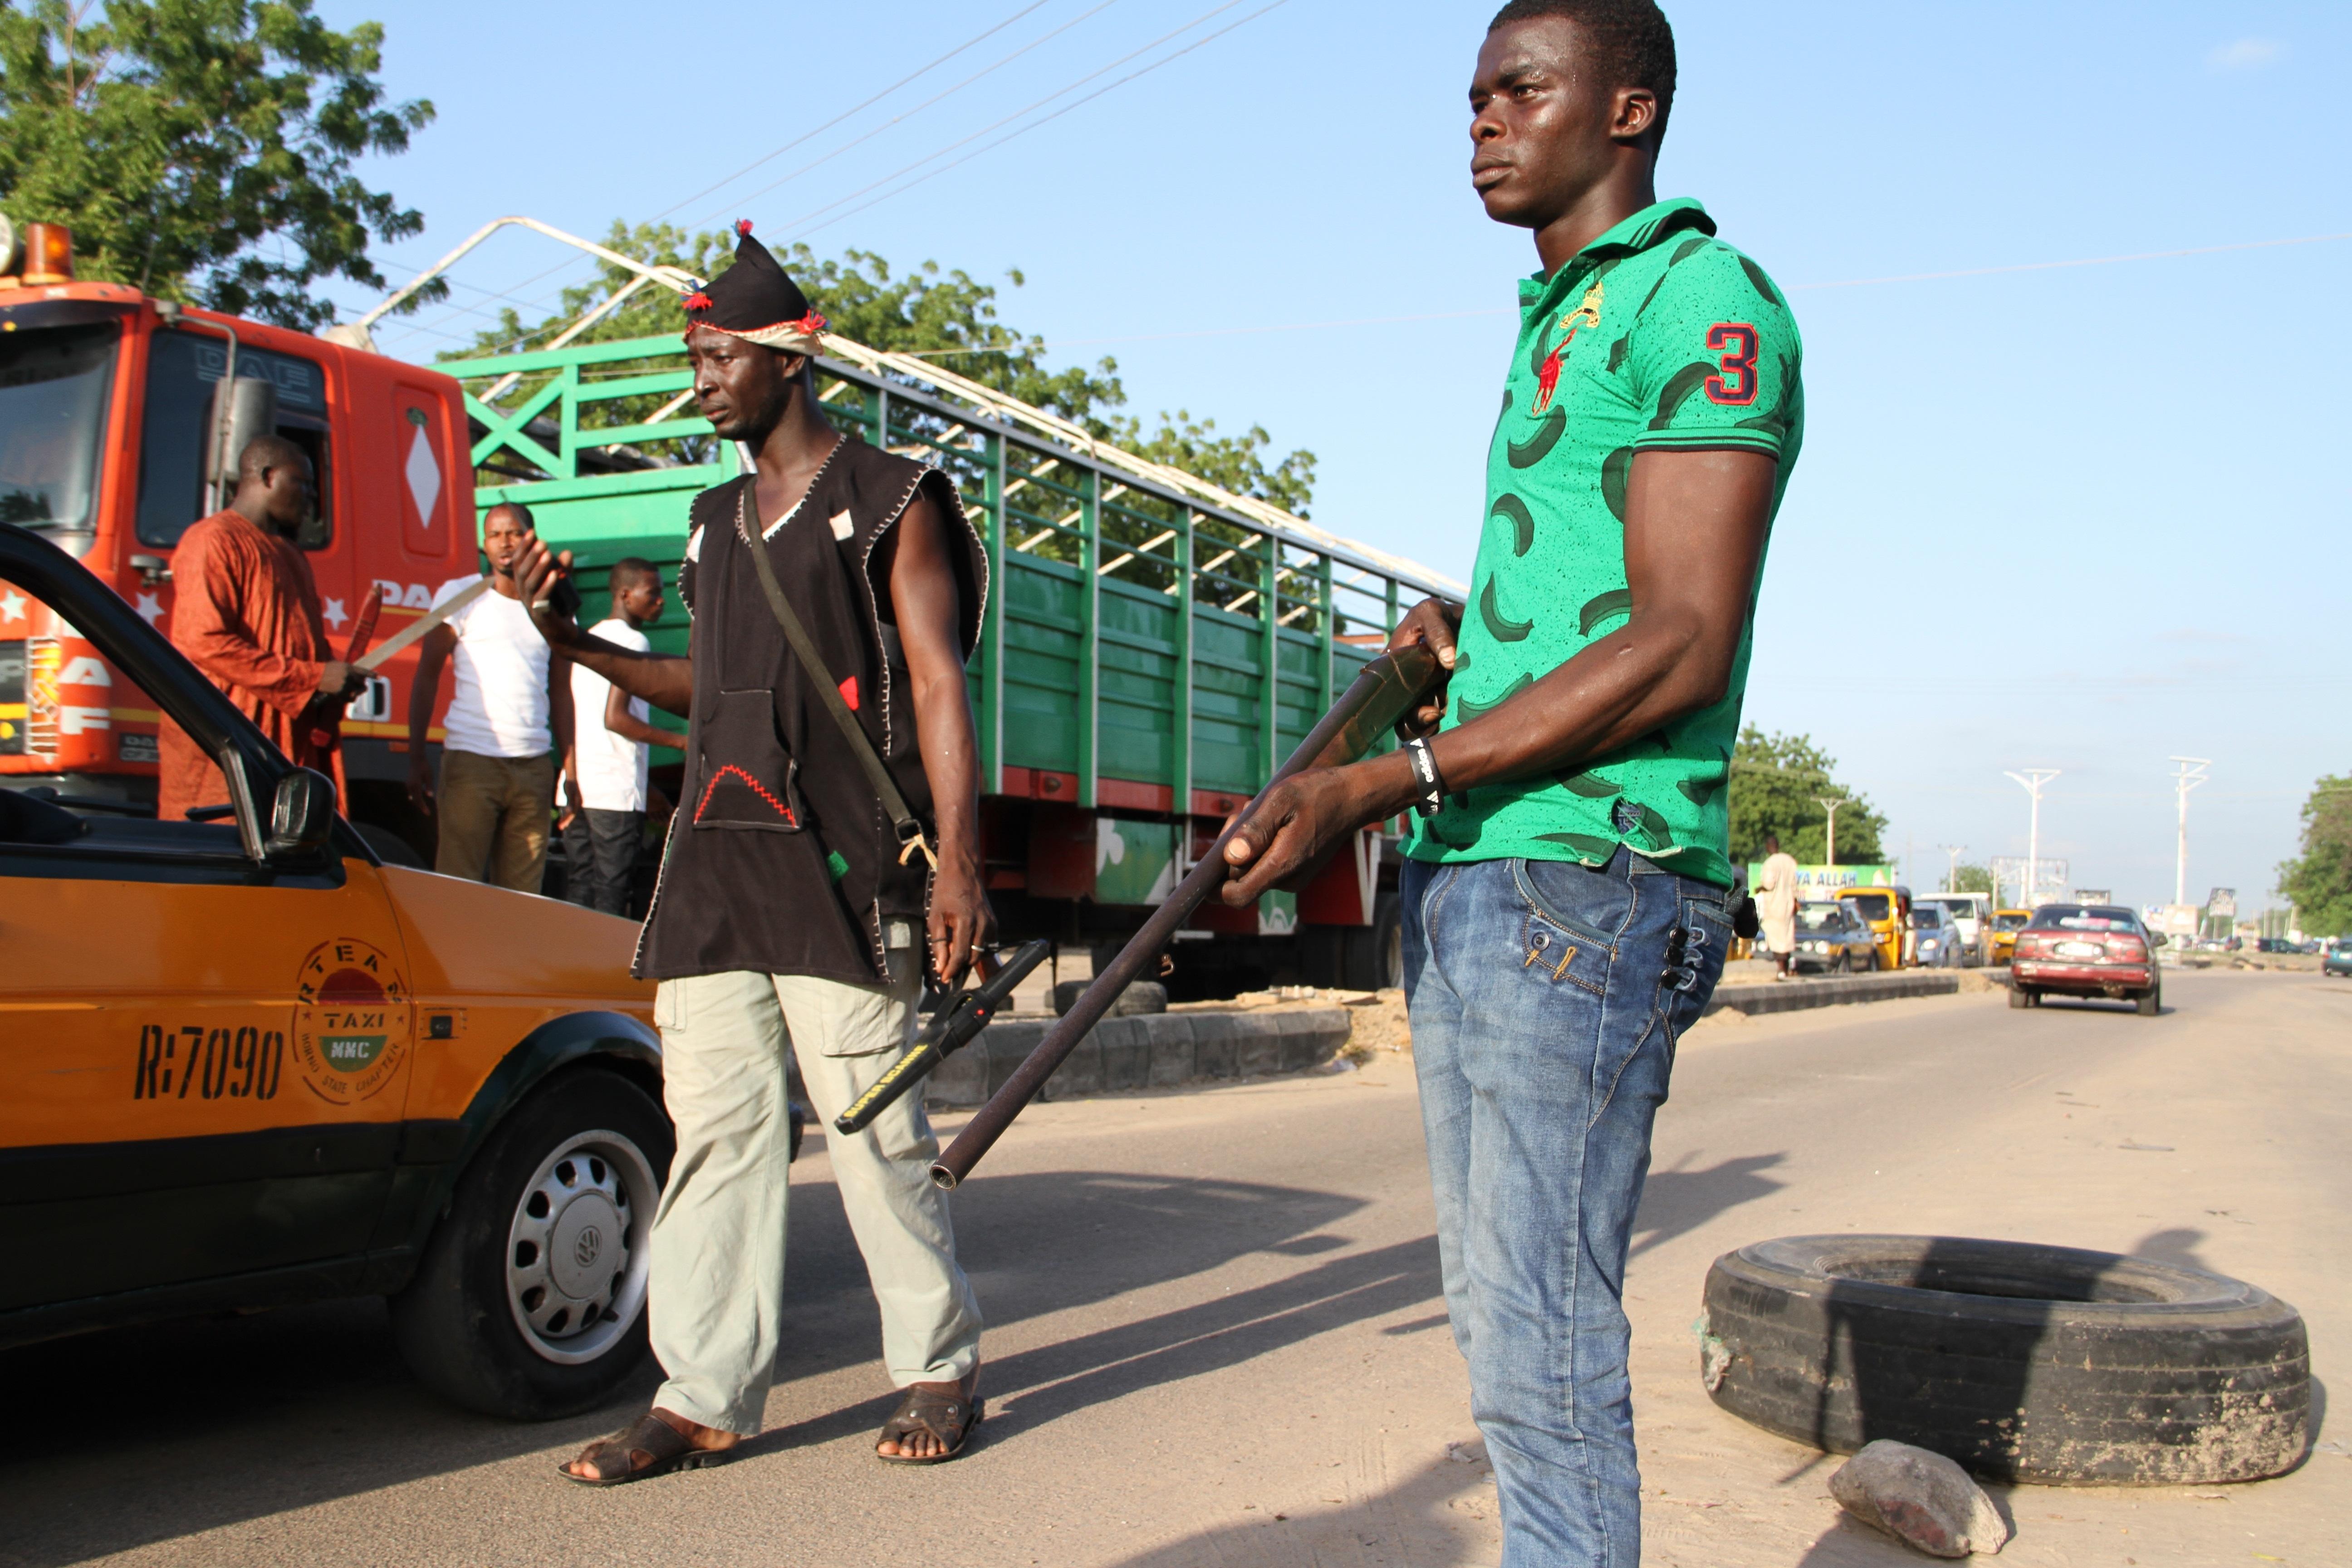 Nigeria claims air strikes